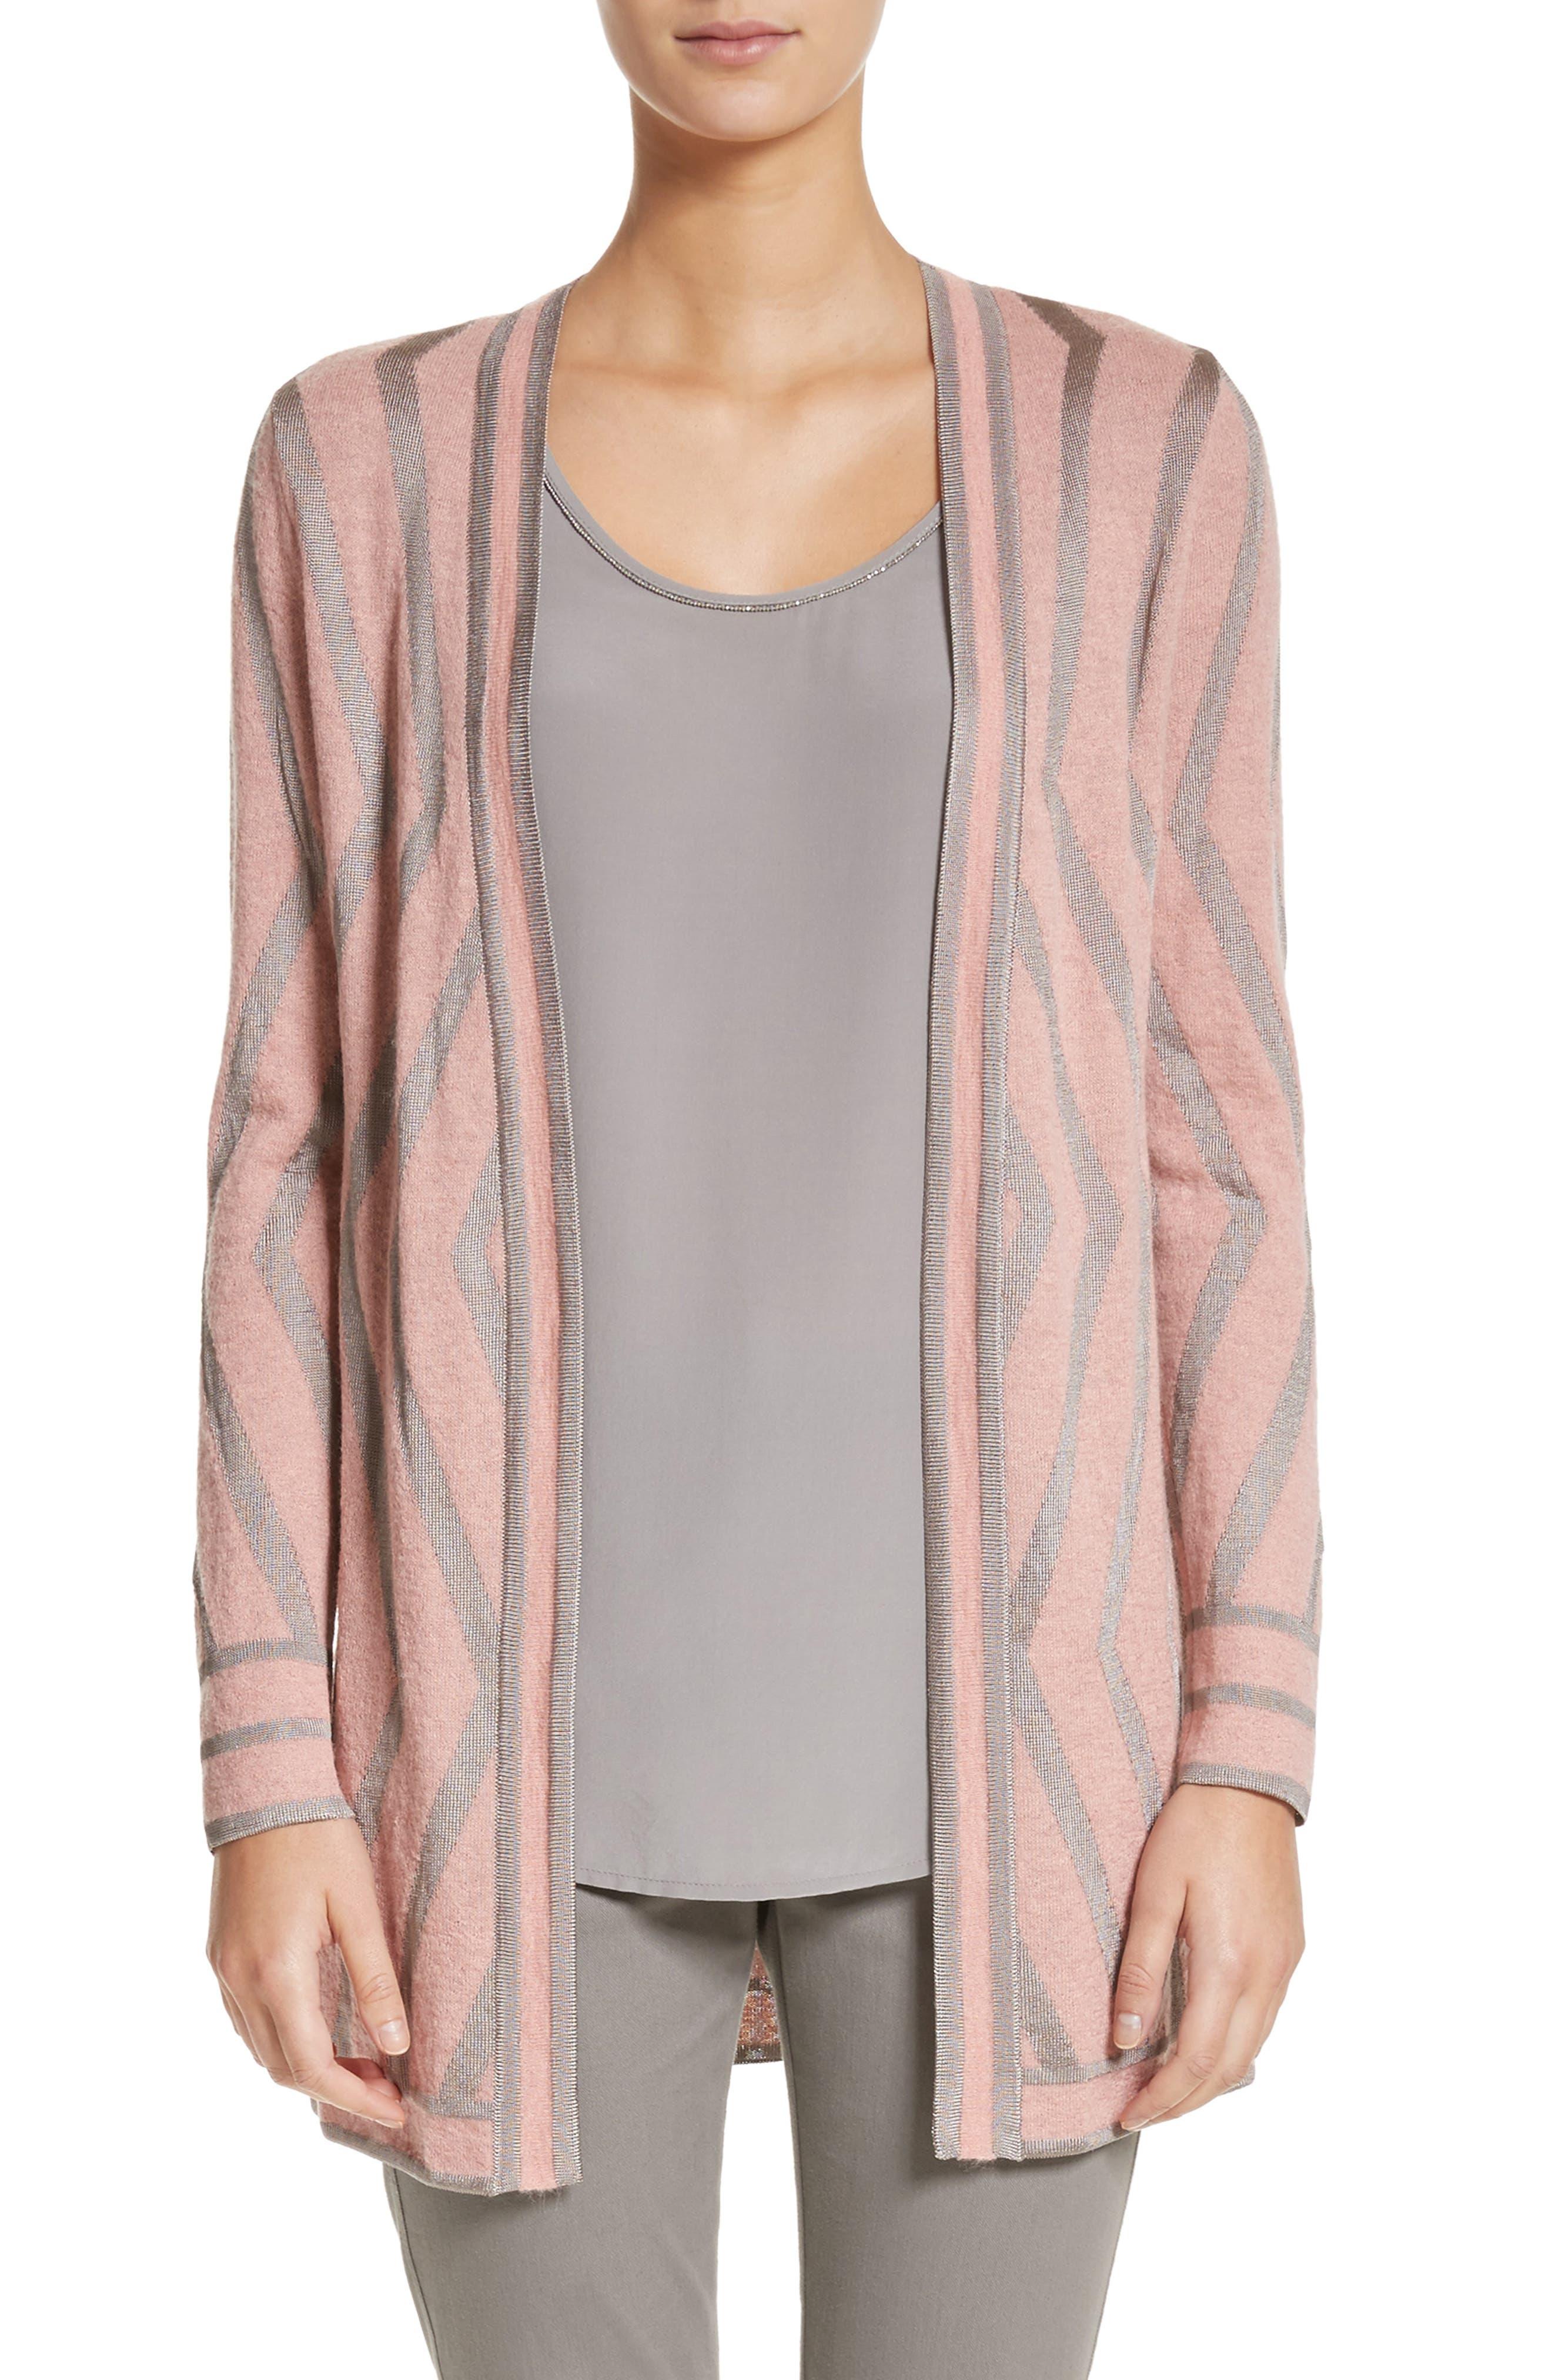 Matte Shine Geo Jacquard Knit Cardigan,                         Main,                         color, Blush Melange/Travertine